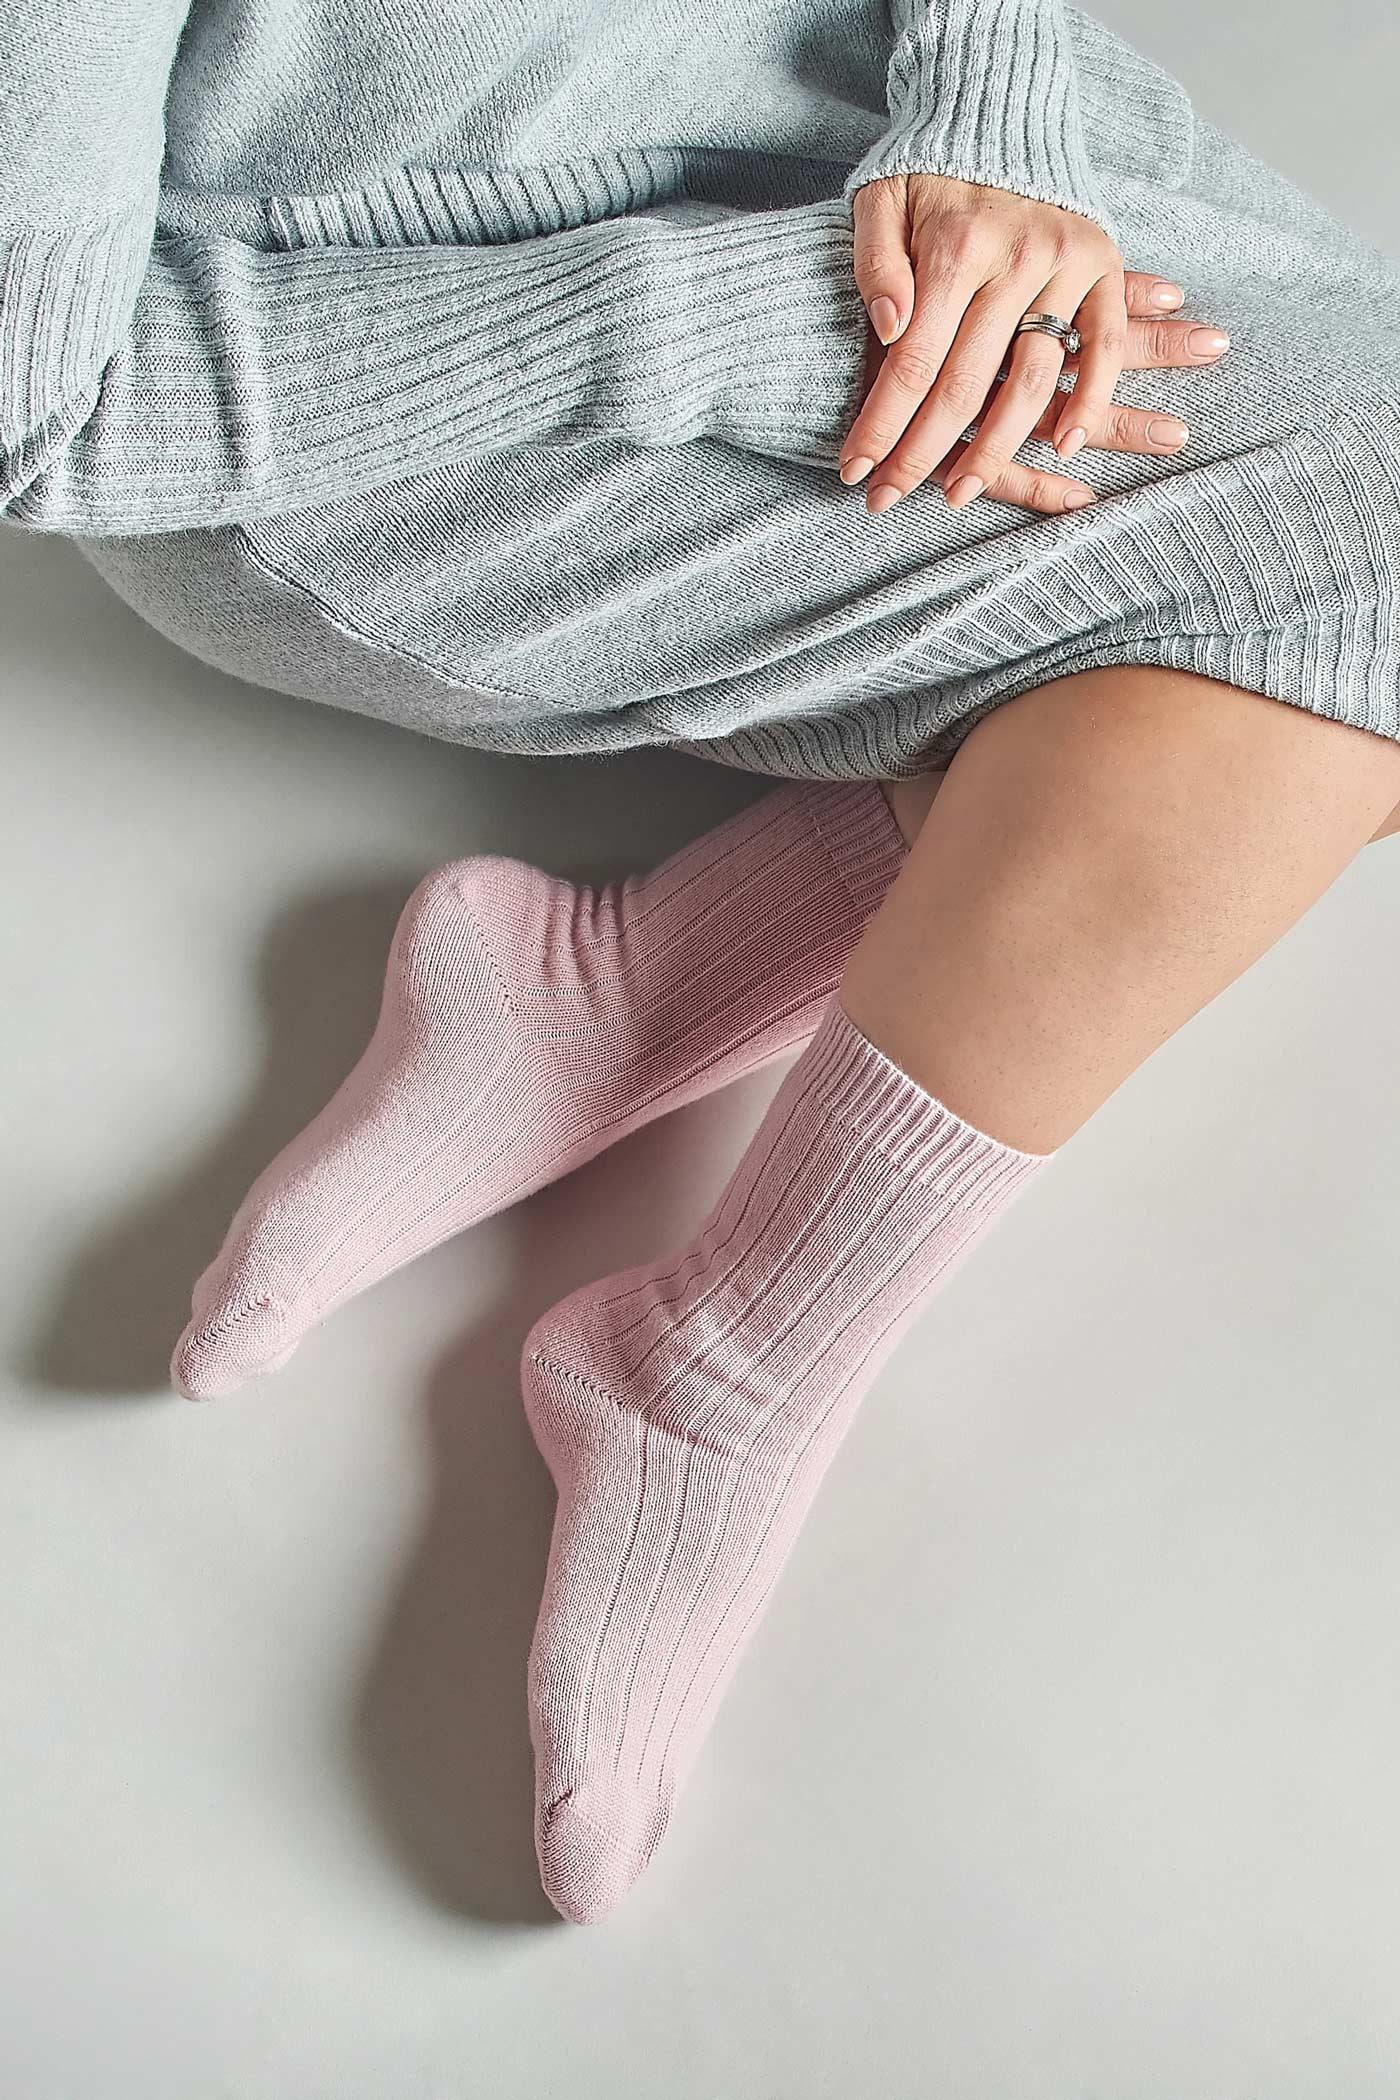 Cashmere pink socks